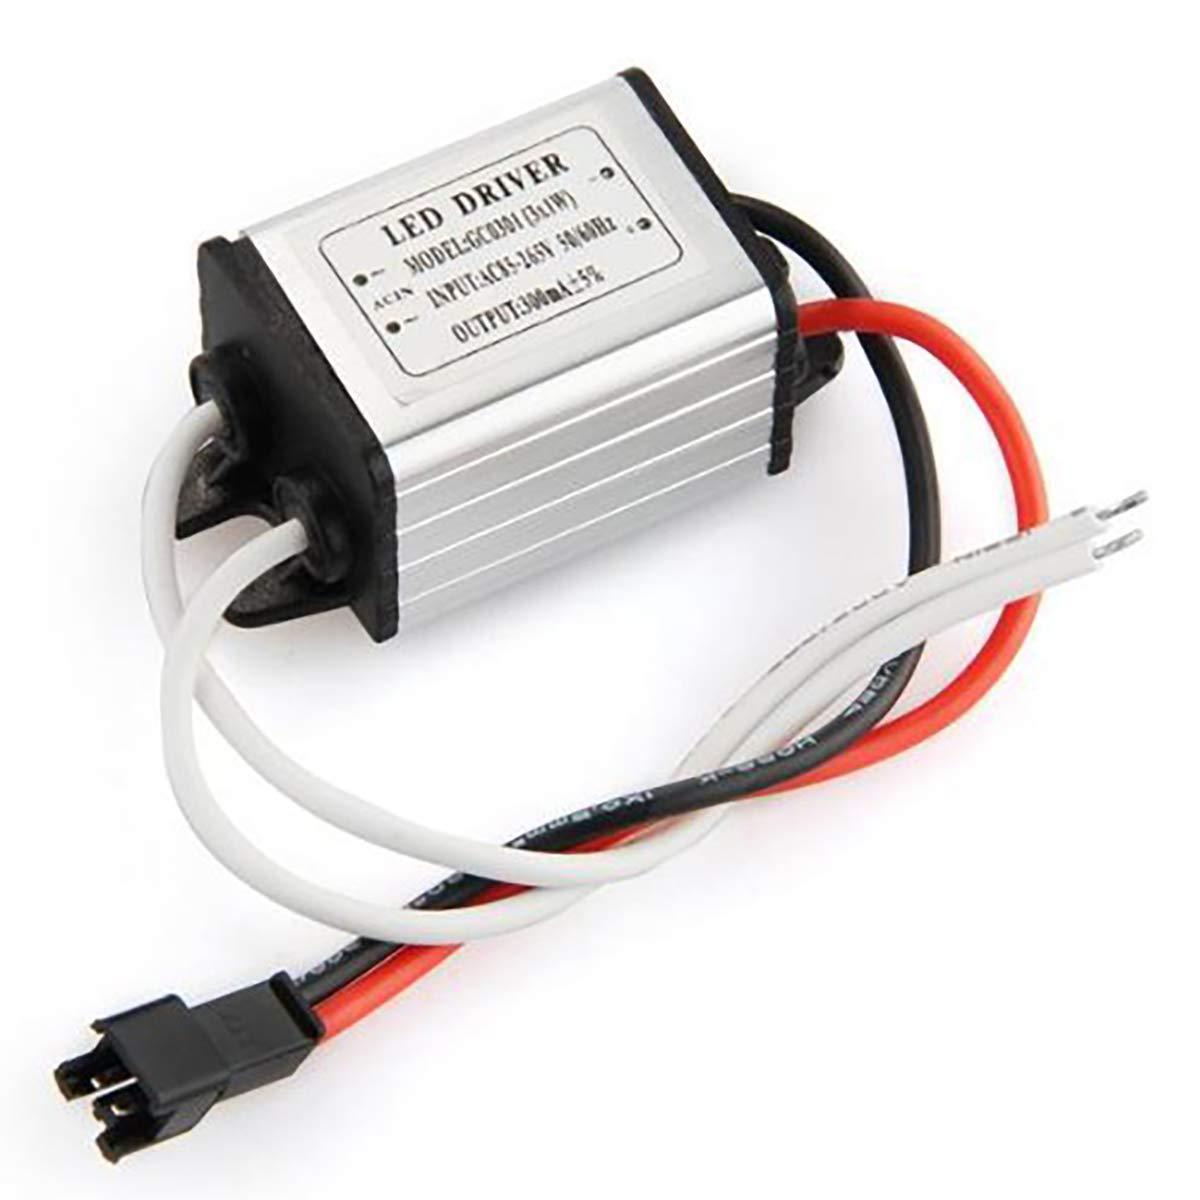 Netzteil Trafo LED Lampe 85-265V AC 12V DC